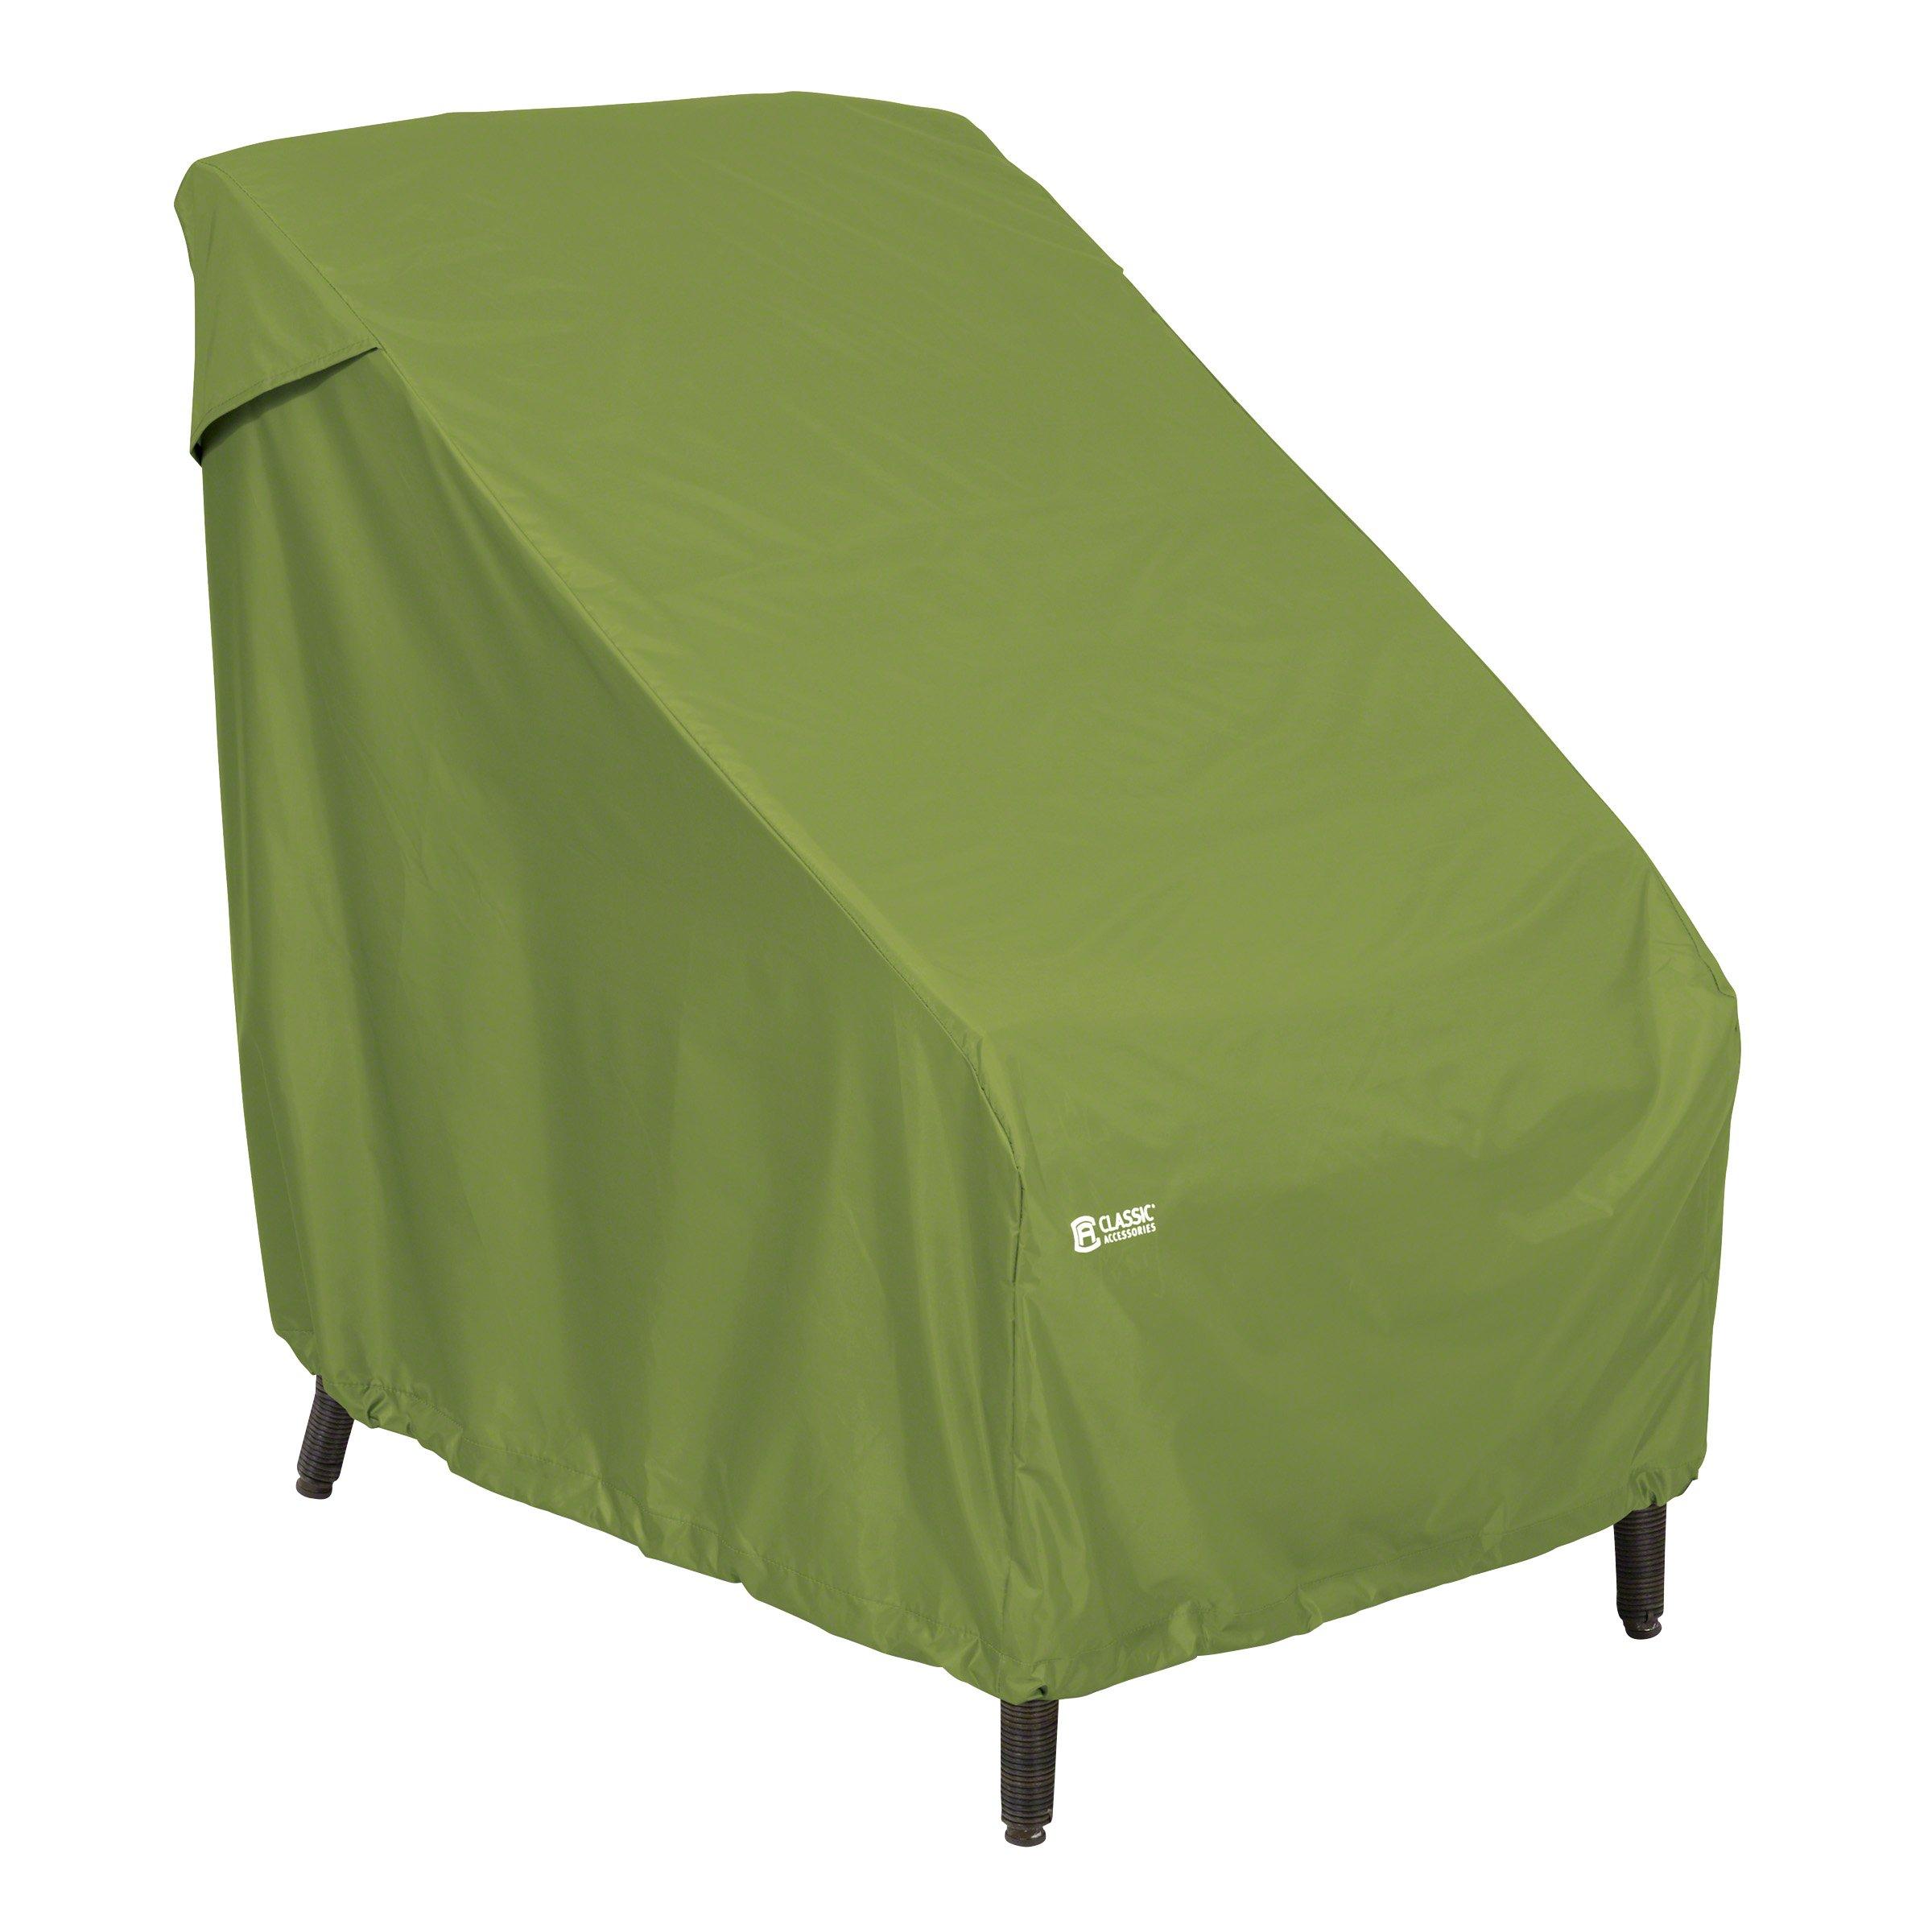 Classic Accessories 55-948-011901-EC Sodo Plus Cover, High Back Chair